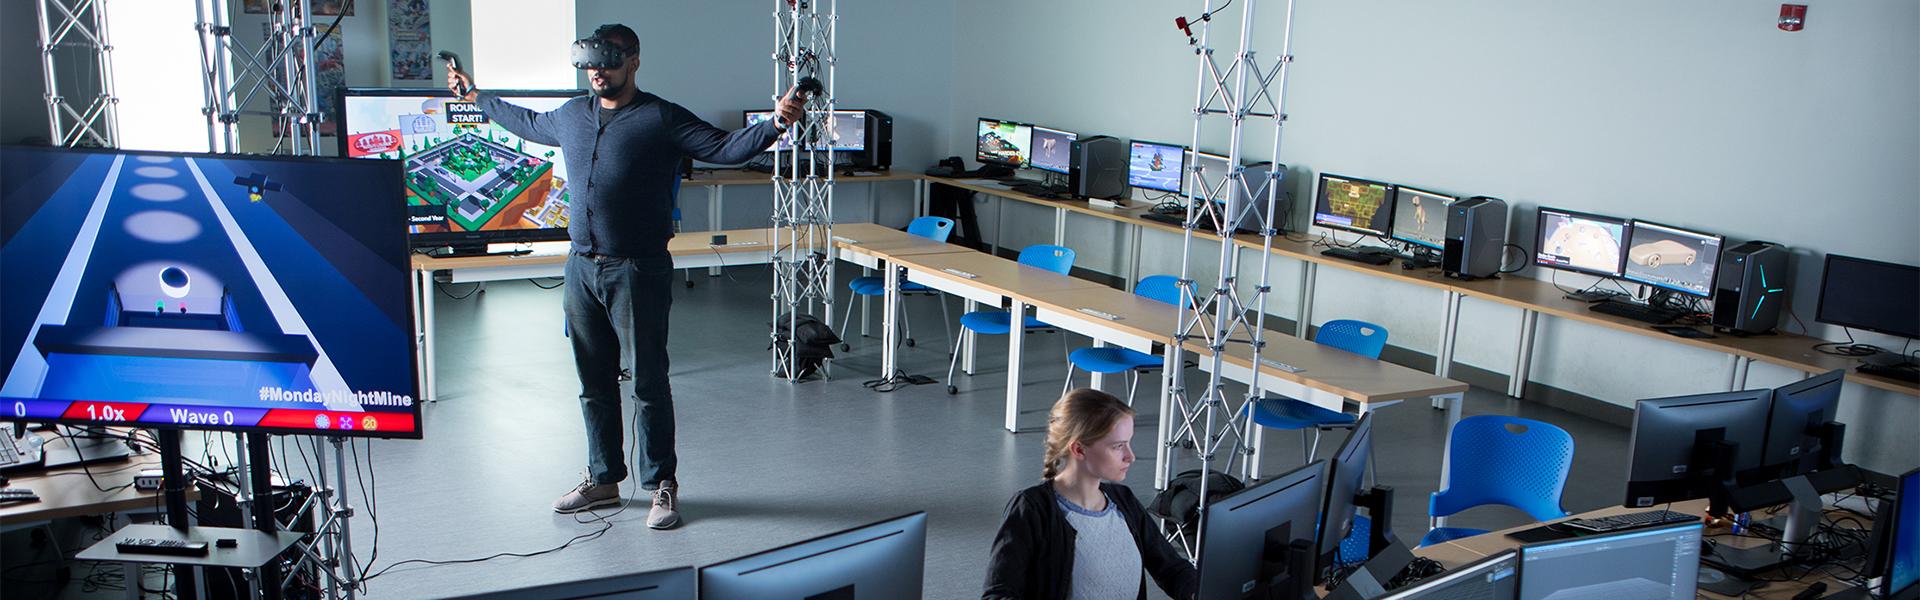 3D Gaming lab